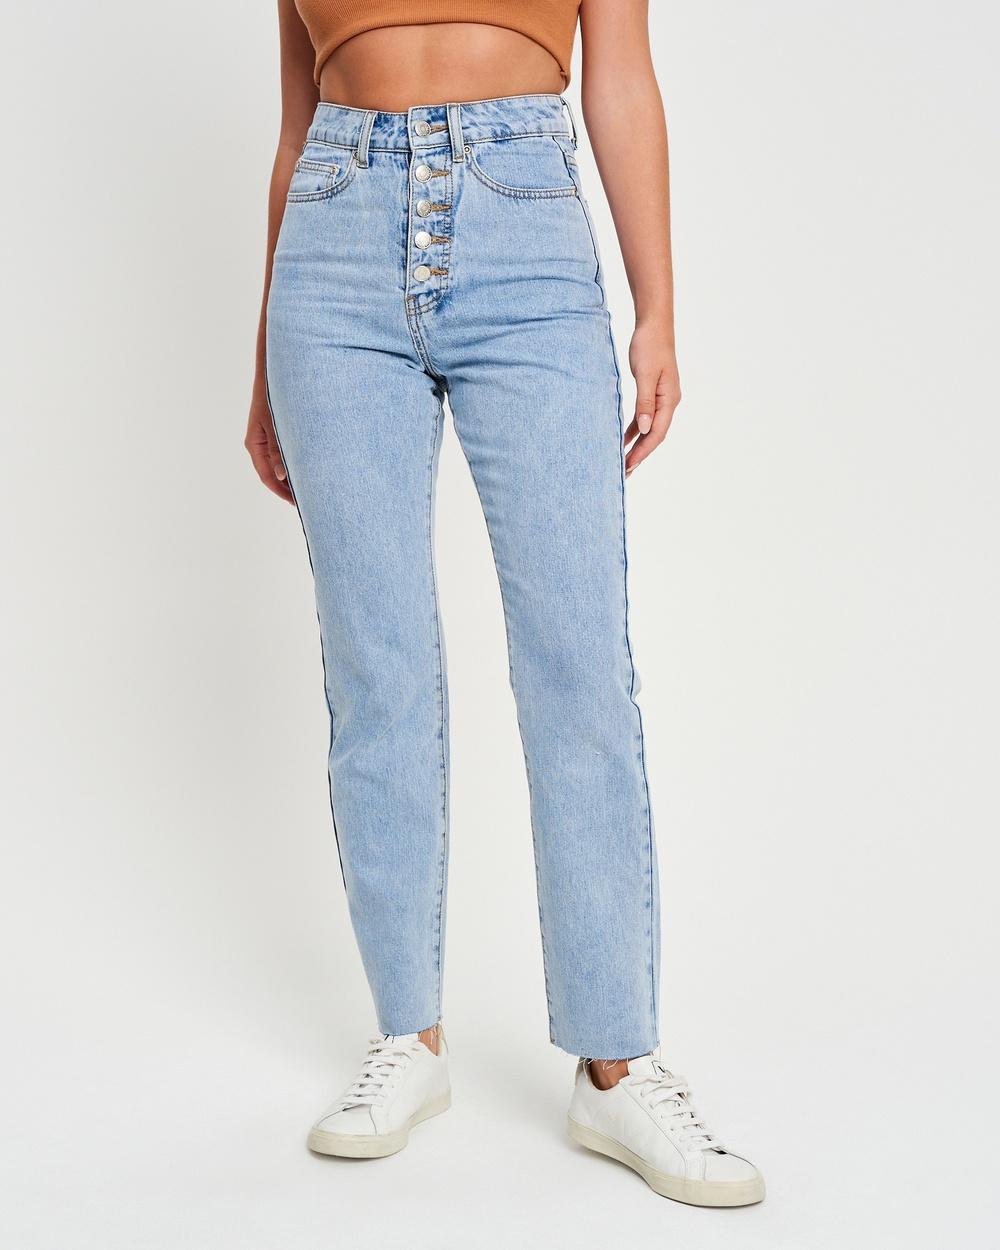 The Fated Nicci Jean Jeans Light Blue Wash Australia